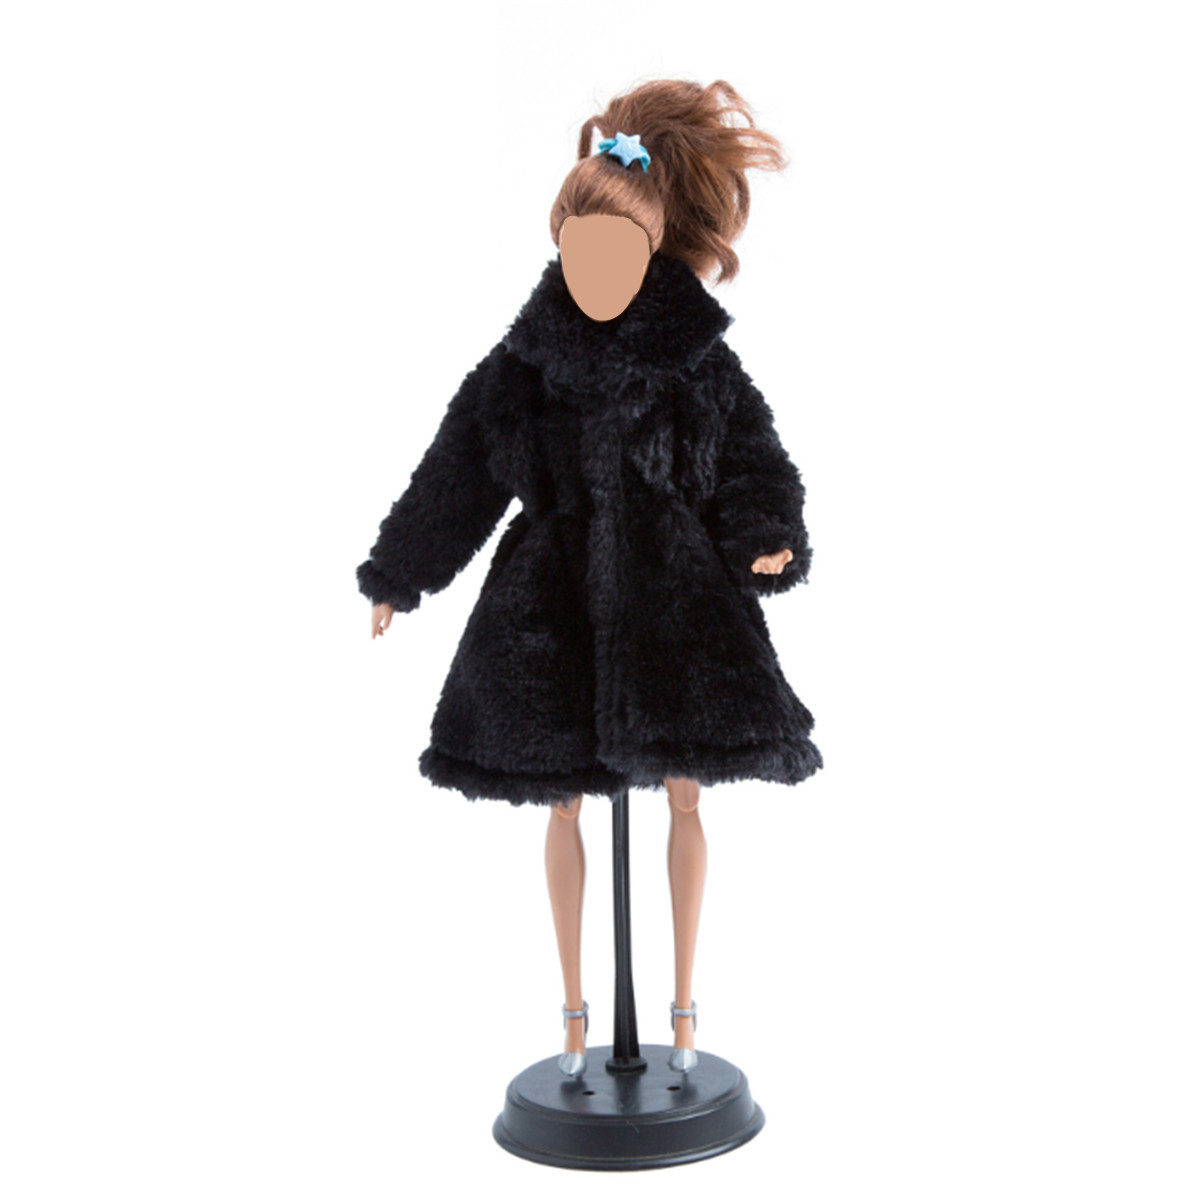 Handmade Fashion Winter Warm Overcoat Plush Fur Coat